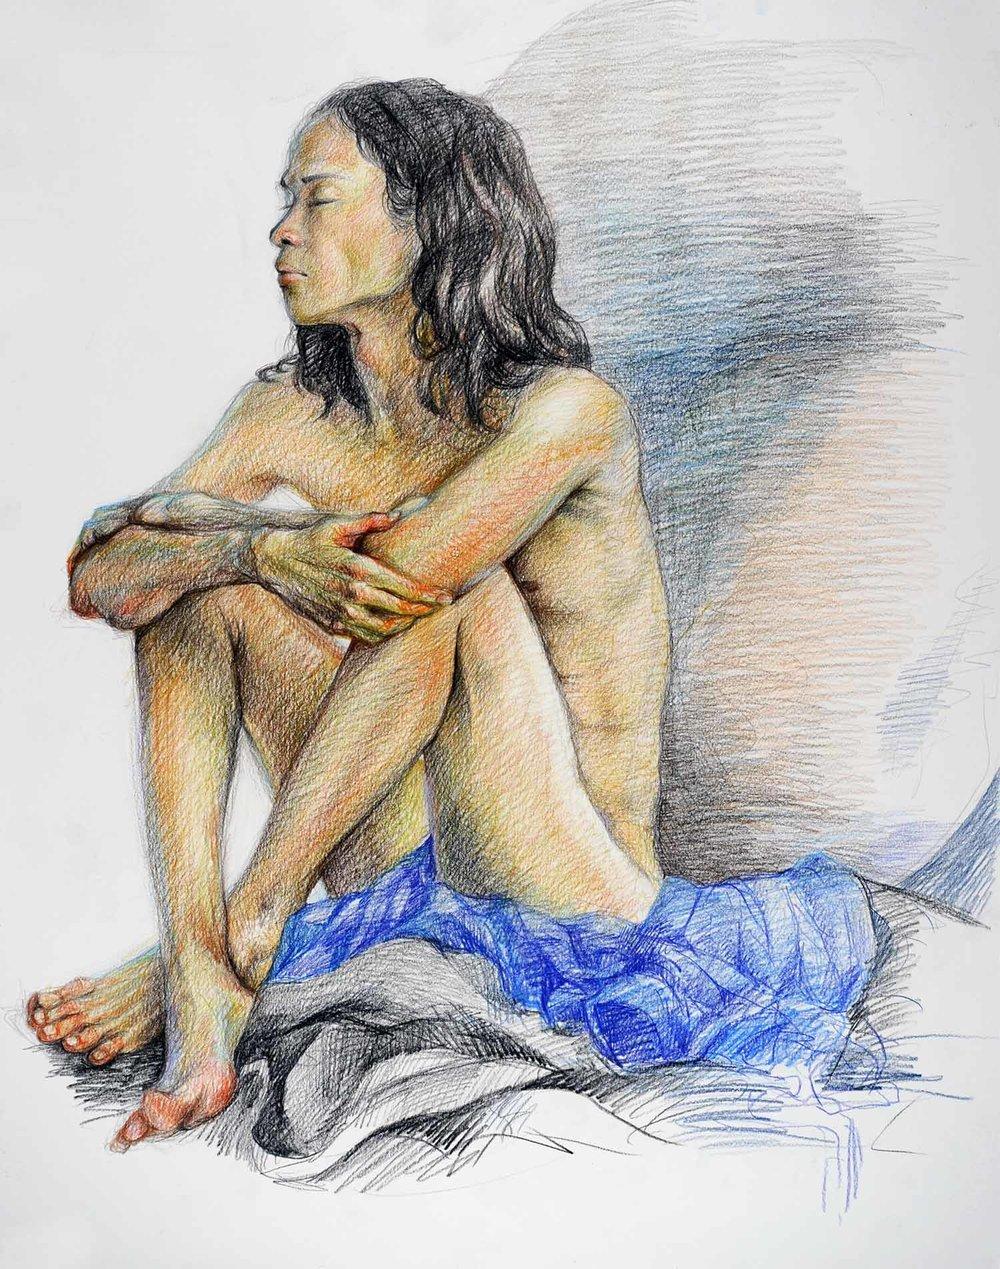 course-figure-drawing-works-05-v01-2018-08.jpg